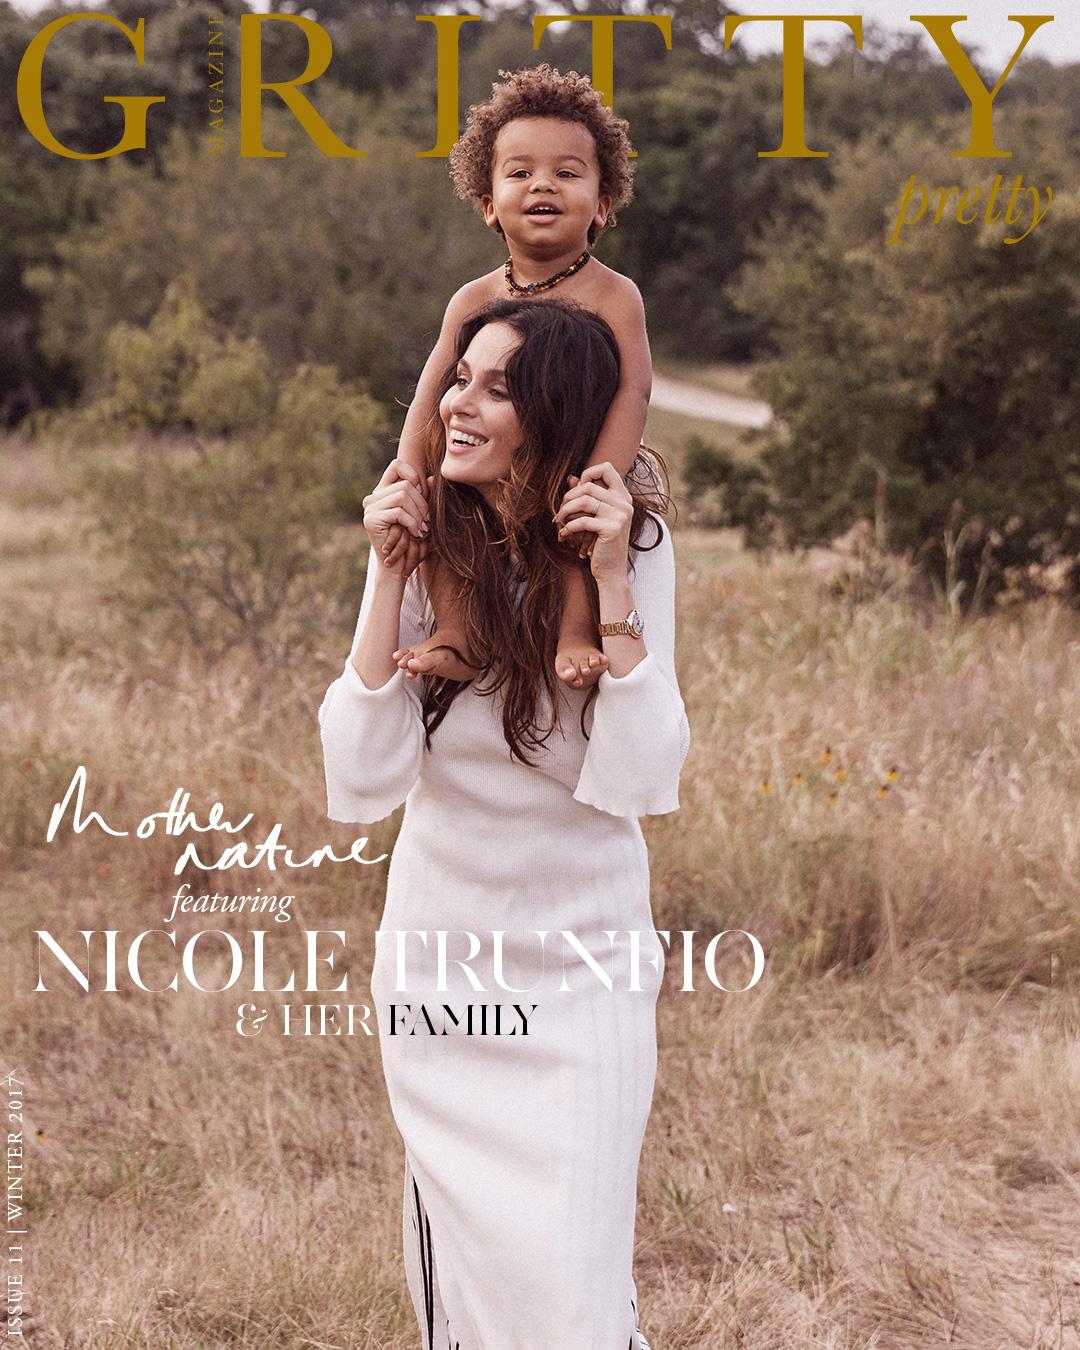 GP_Issue11_NicoleTrunfio_INSTAGRAM_1080x1320px_1(3).jpg